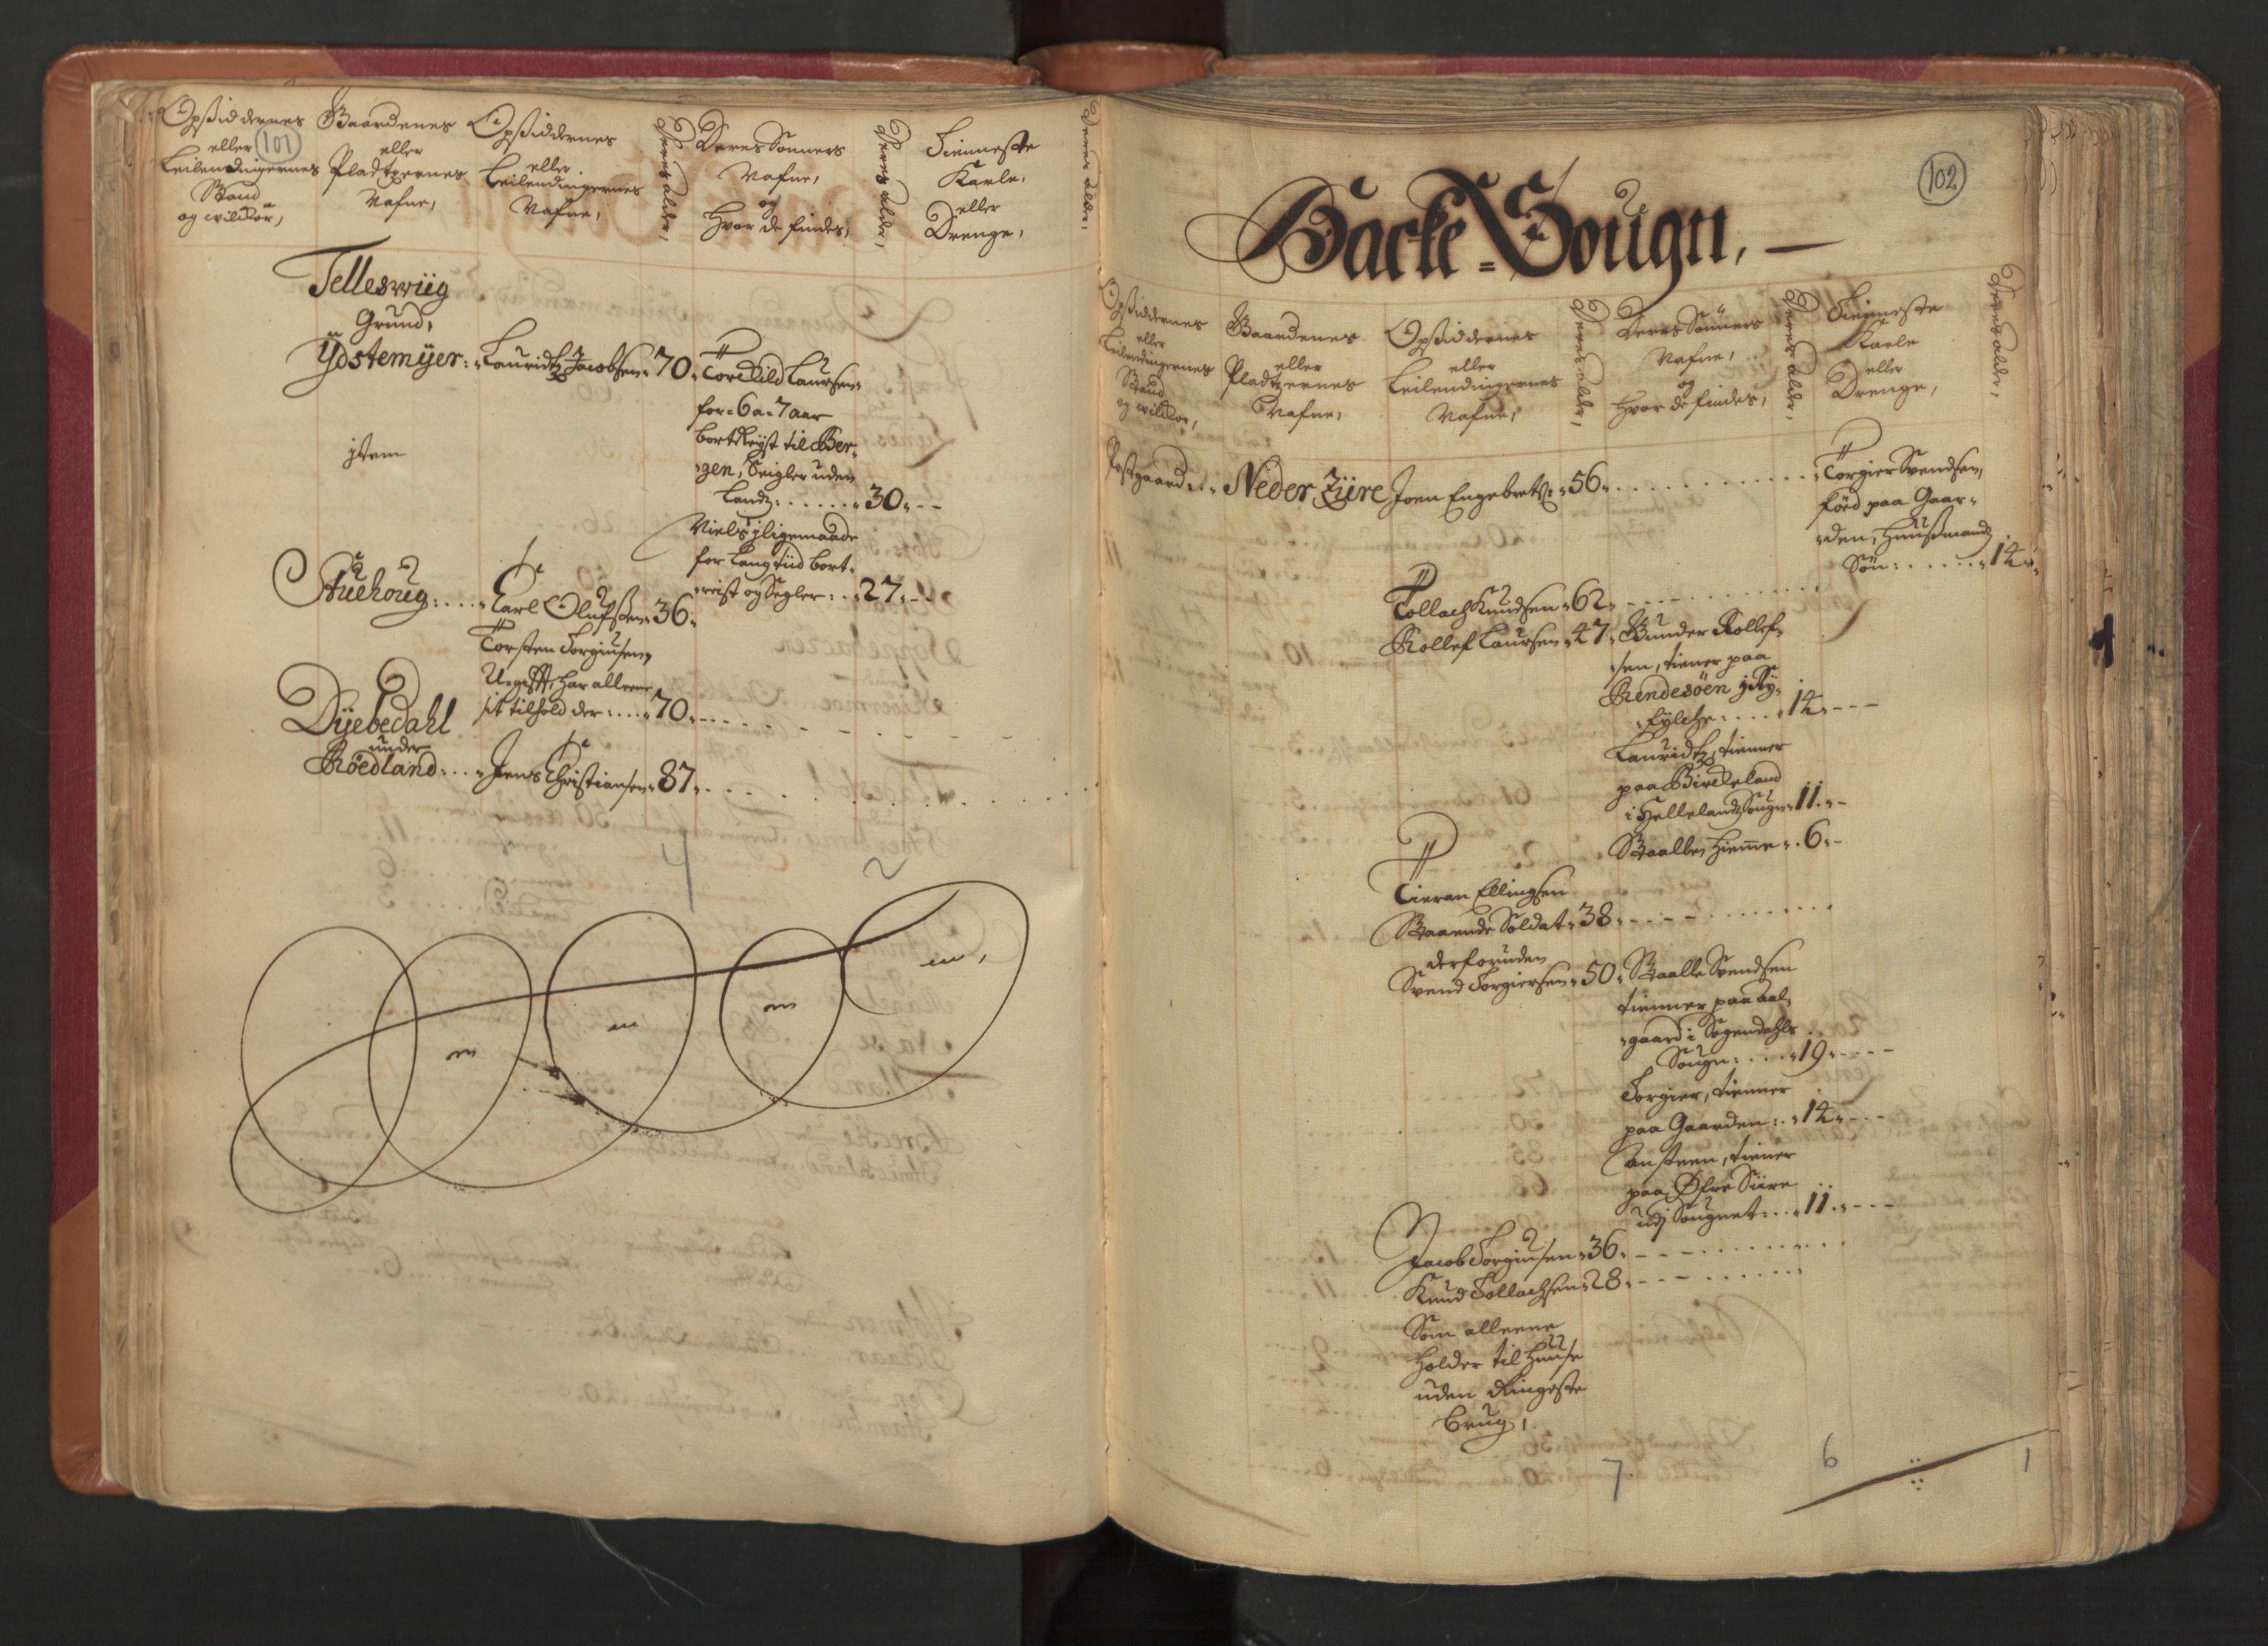 RA, Manntallet 1701, nr. 4: Jæren og Dalane fogderi, 1701, s. 101-102